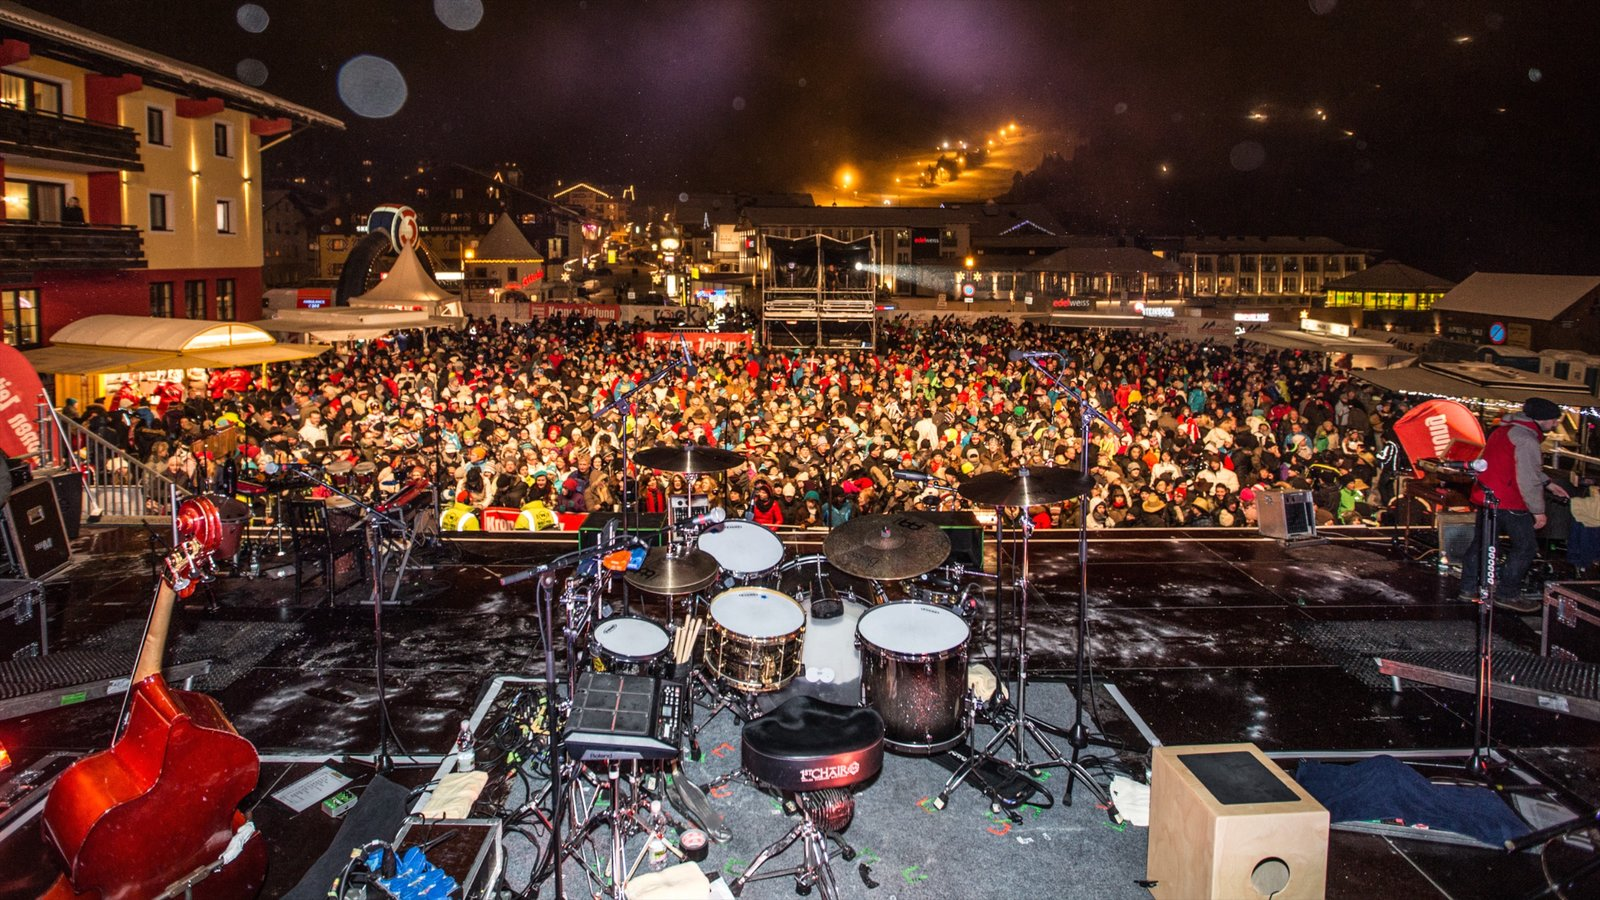 Obertauern featuring performance art, night scenes and nightlife